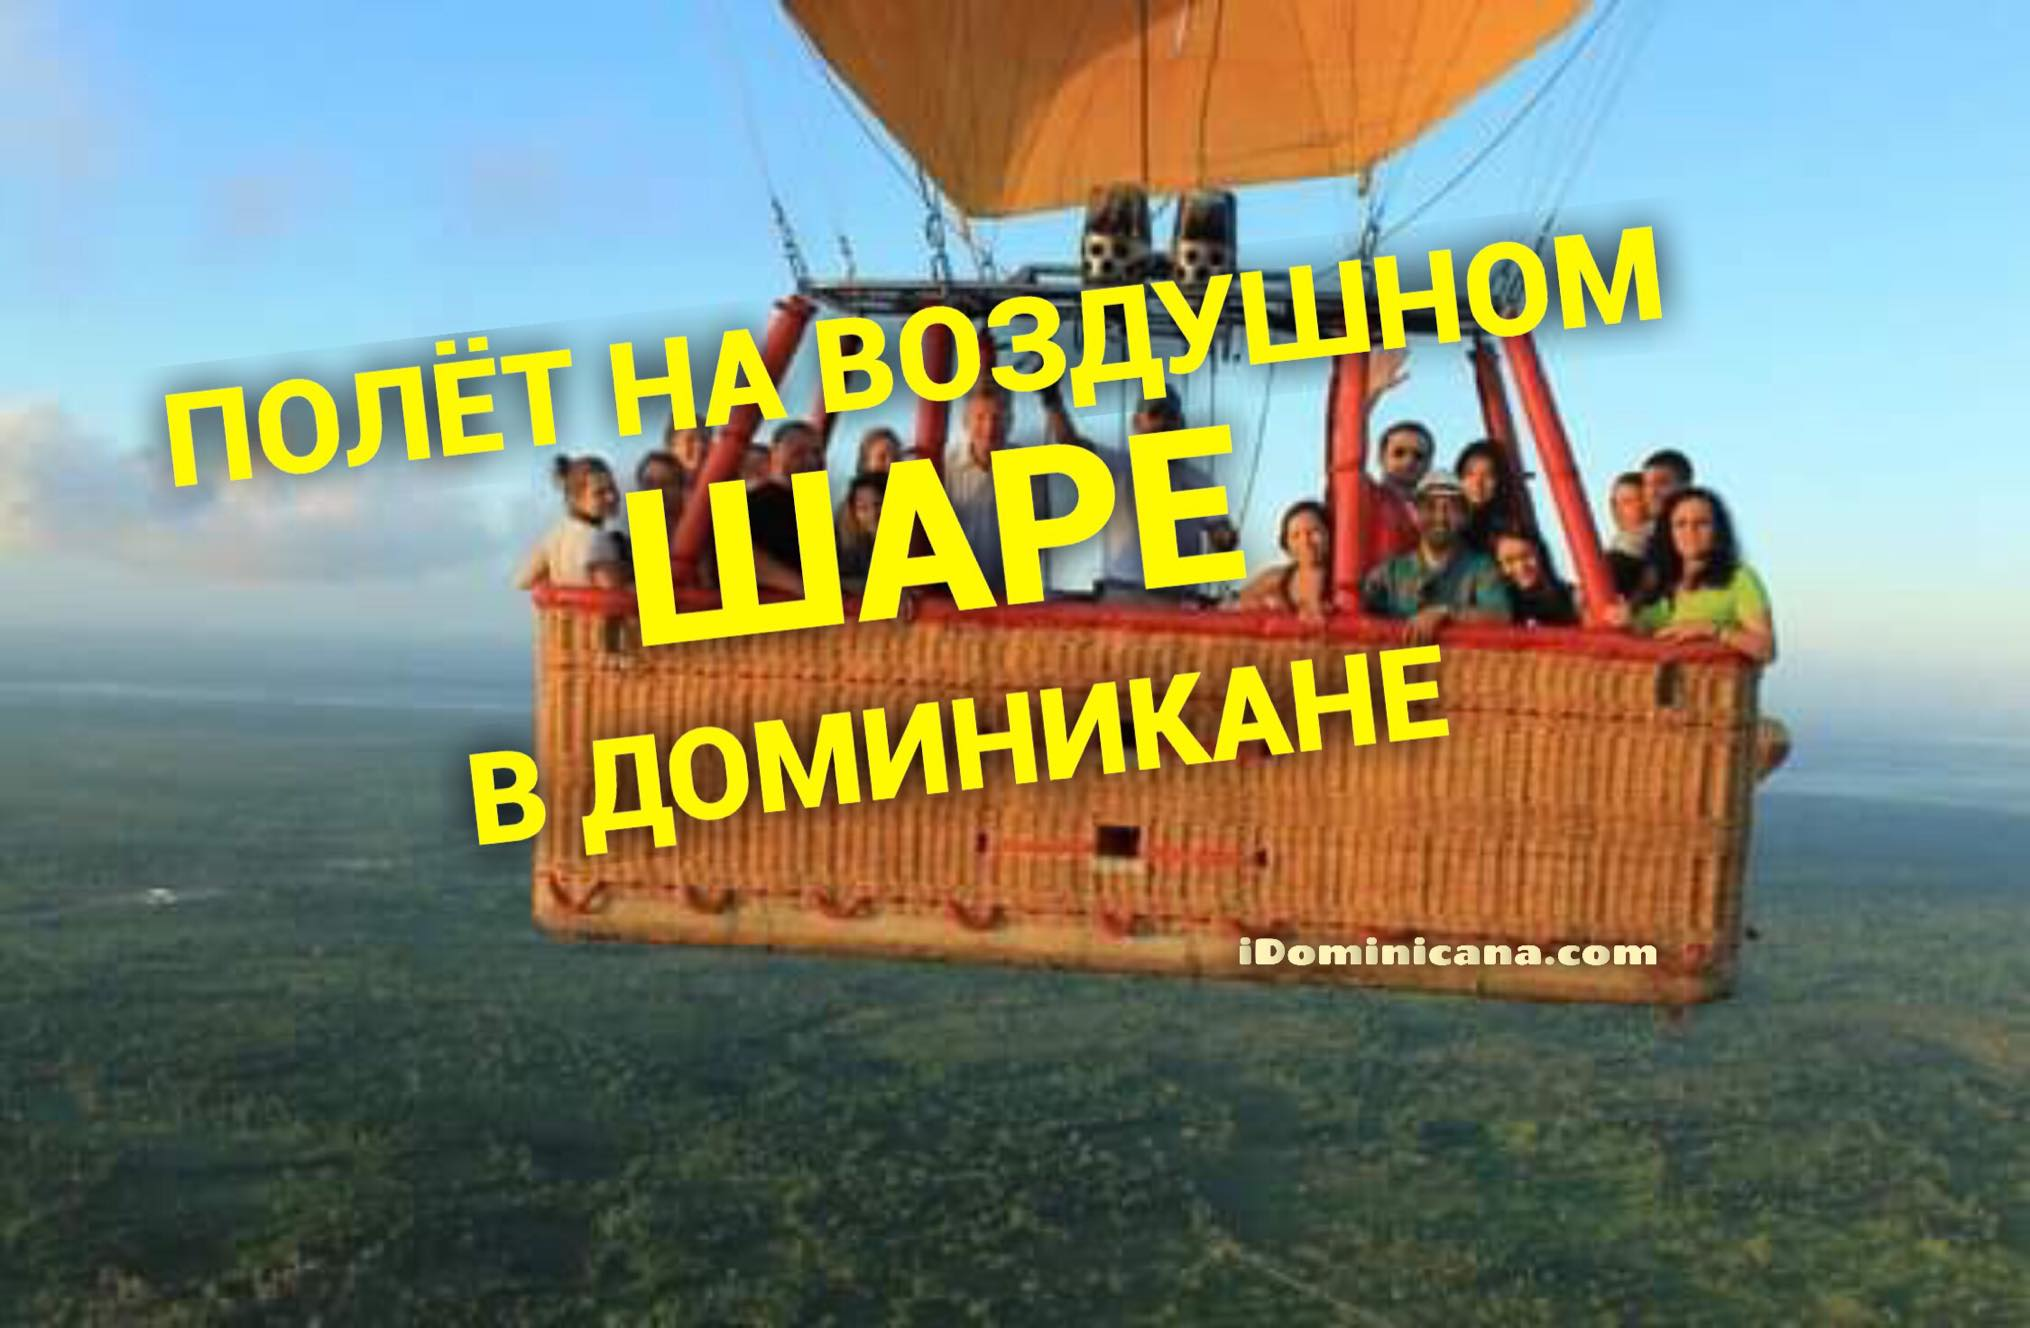 Полет на воздушном шаре АйДоминикана iDominicana.com